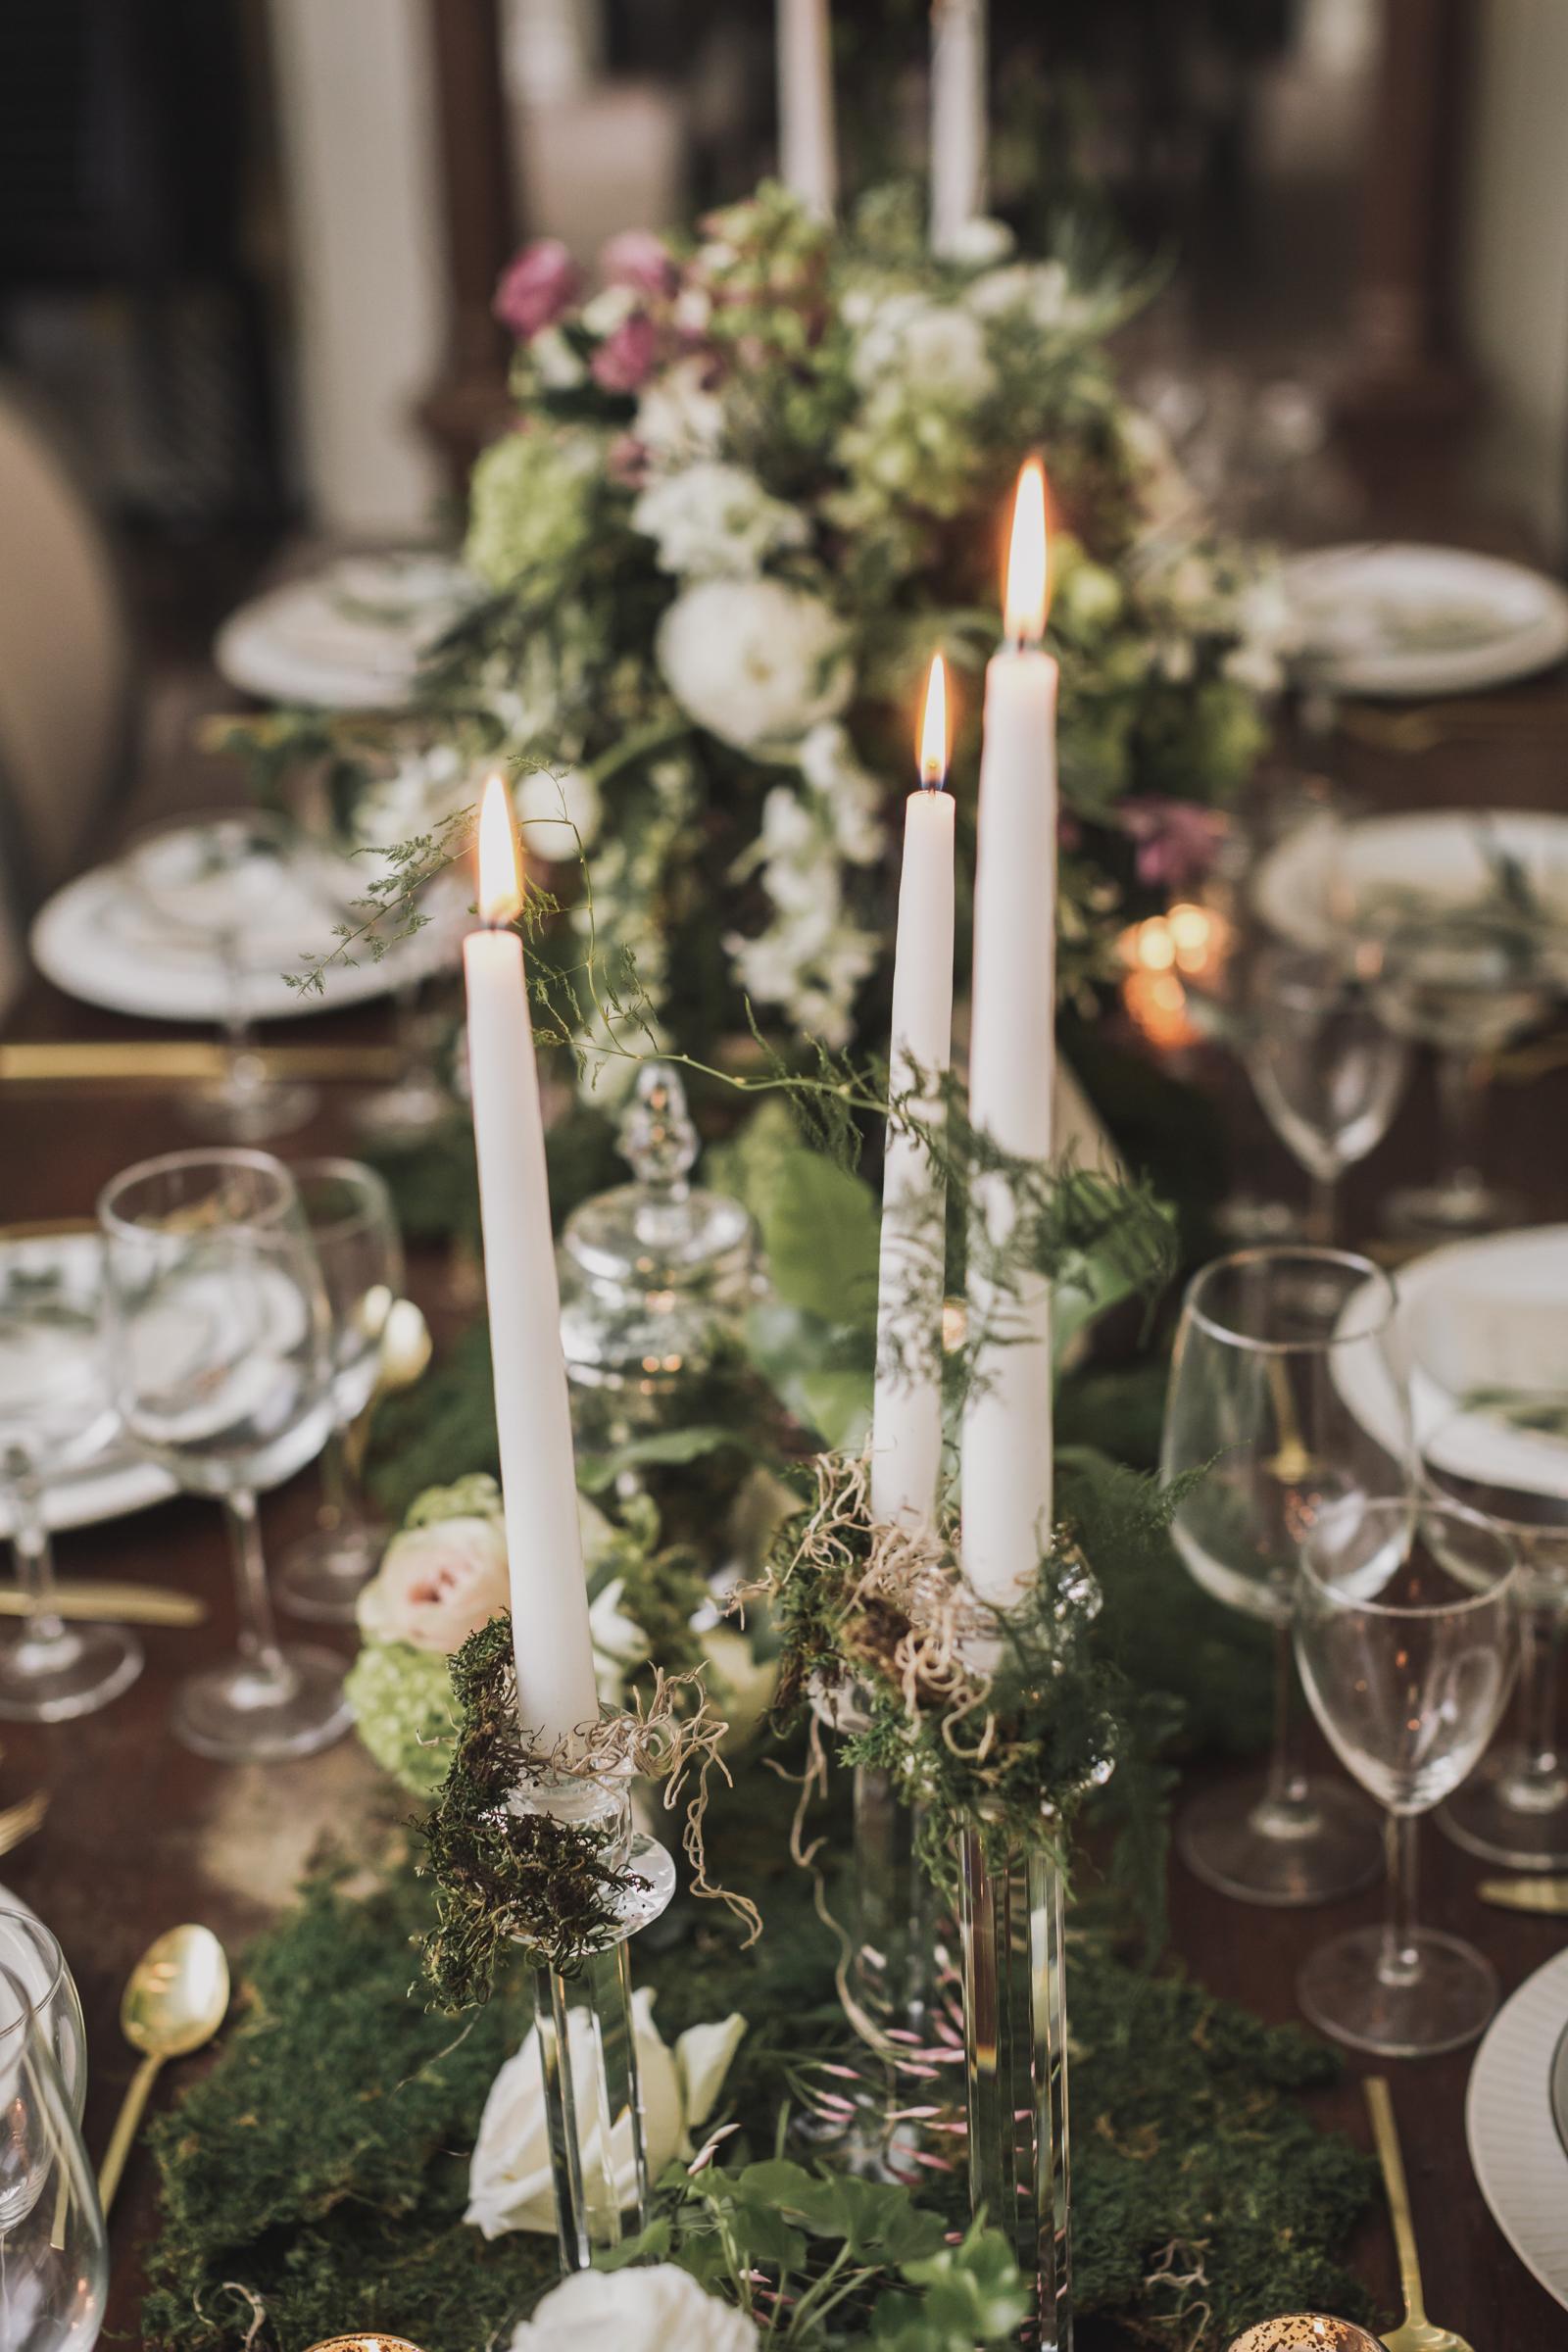 20160310-124-Barrow_Mansion_Wedding_Editorial.jpg